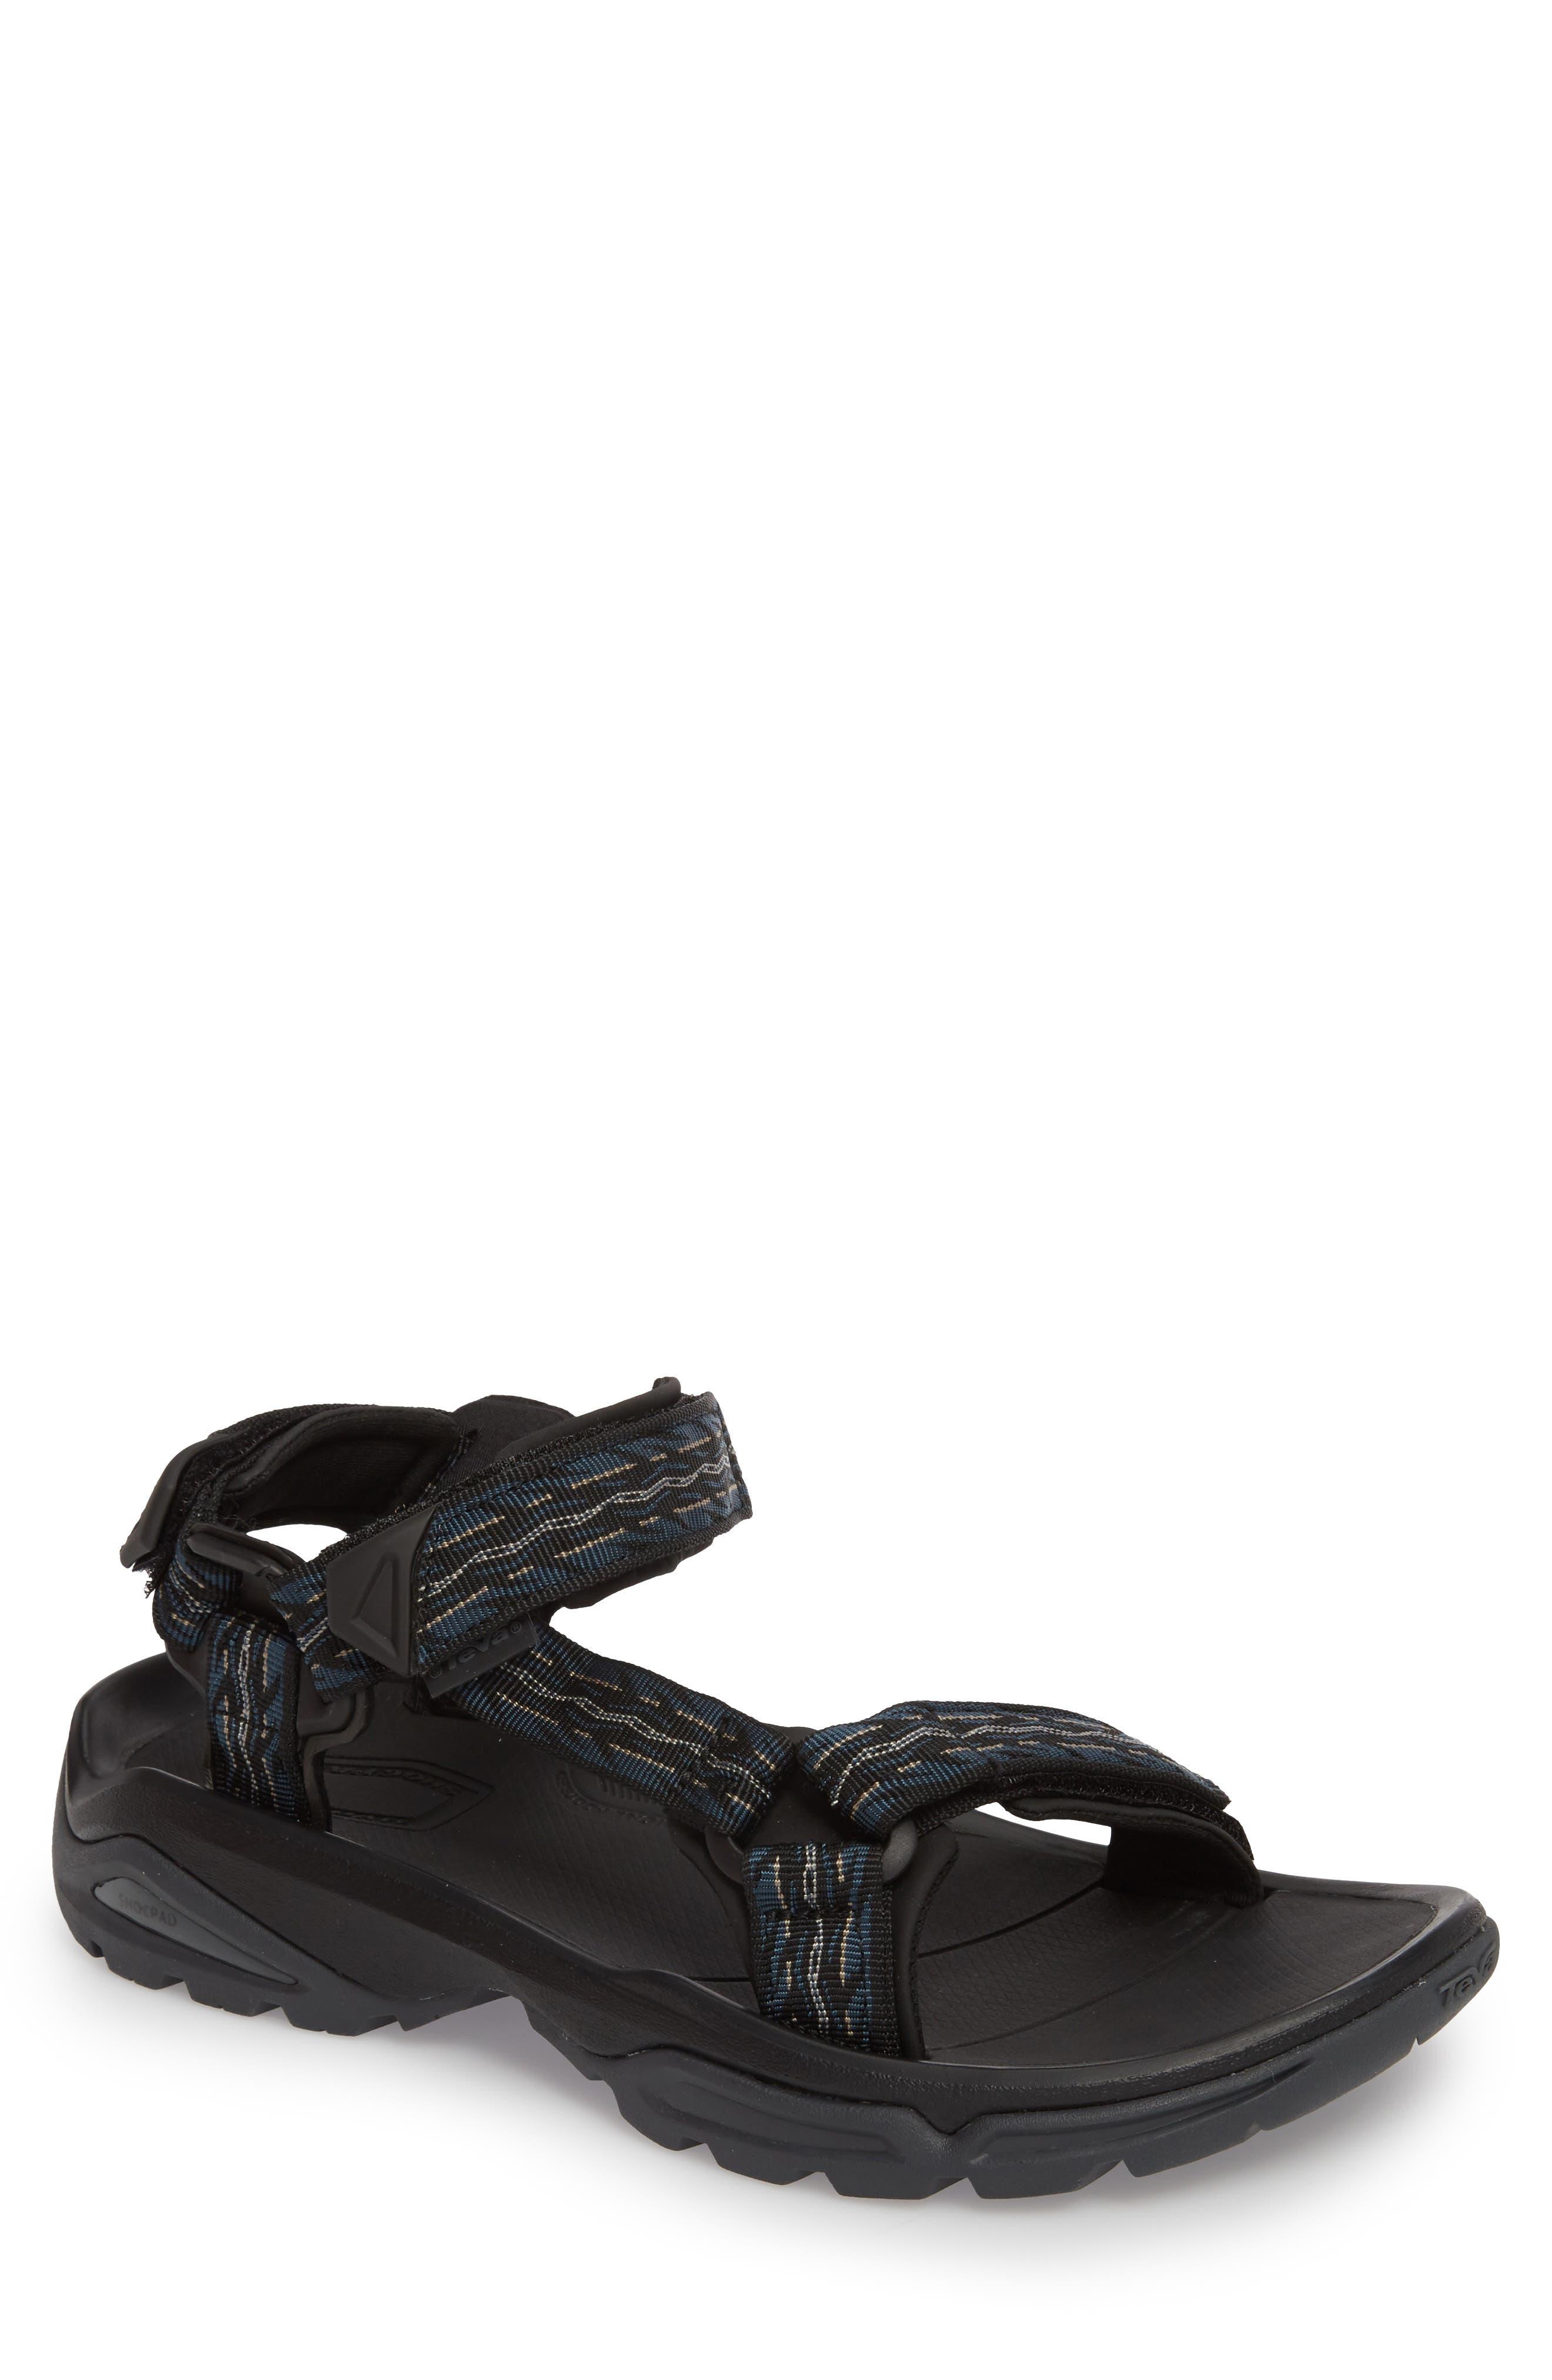 TEVA Terra Fi 4 Sport Sandal, Main, color, MIDNIGHT BLUE NYLON